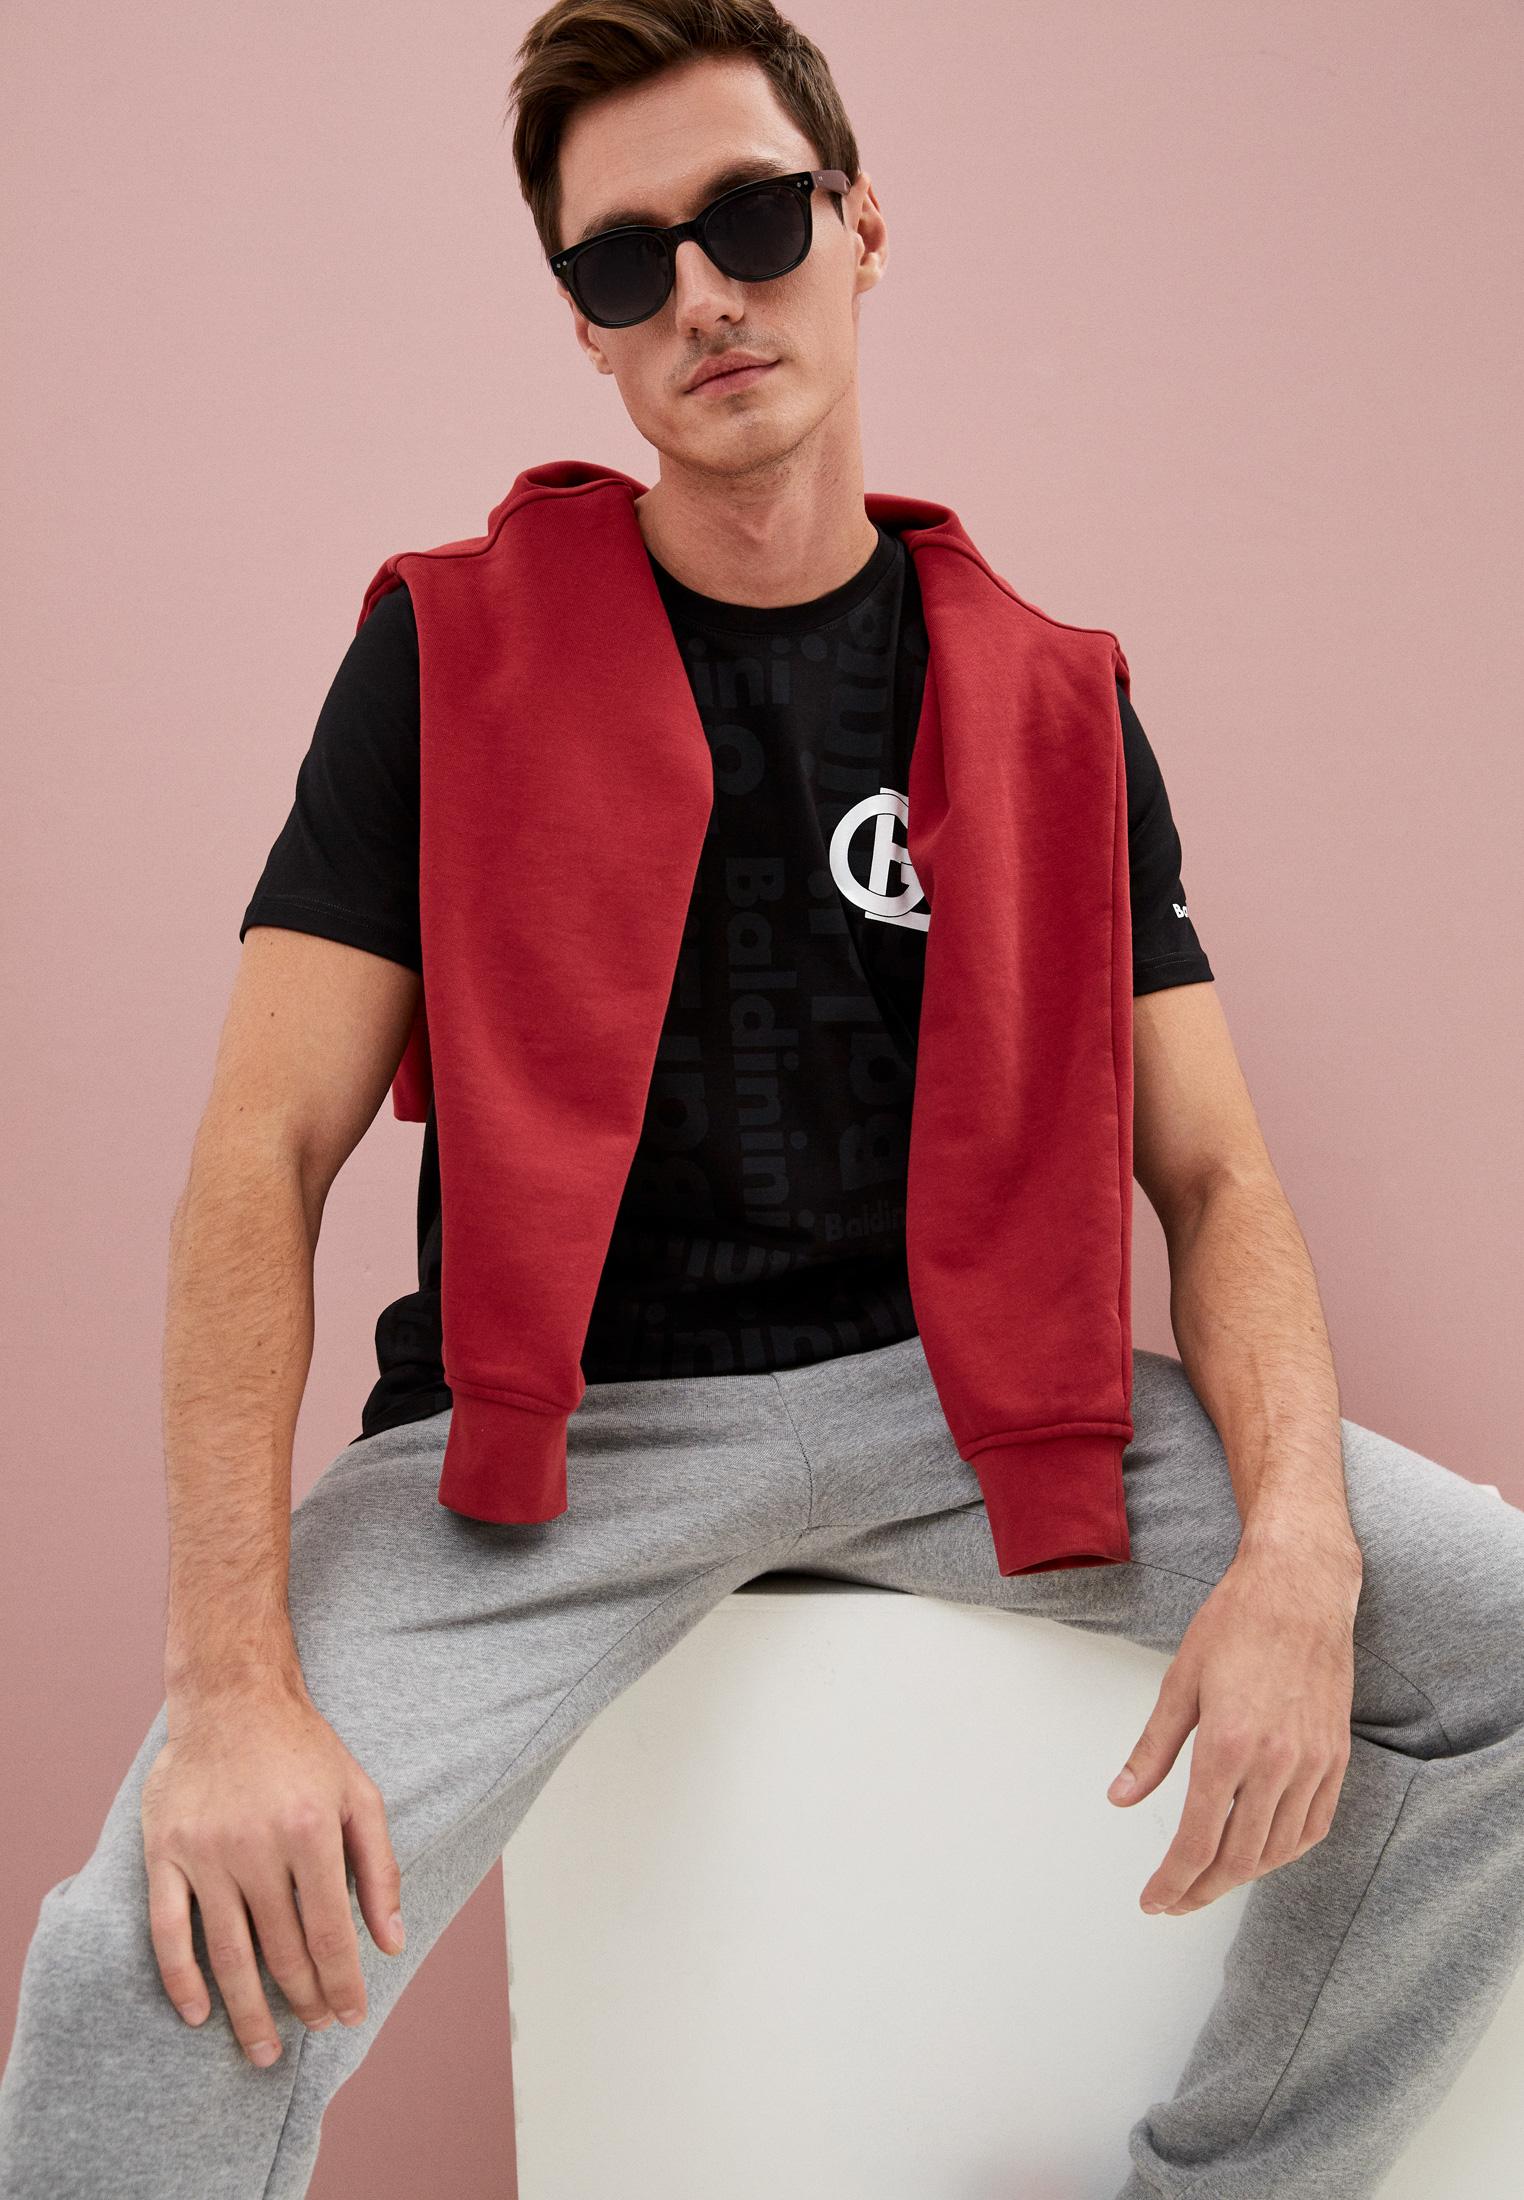 Мужская футболка Baldinini (Балдинини) TSU06: изображение 2